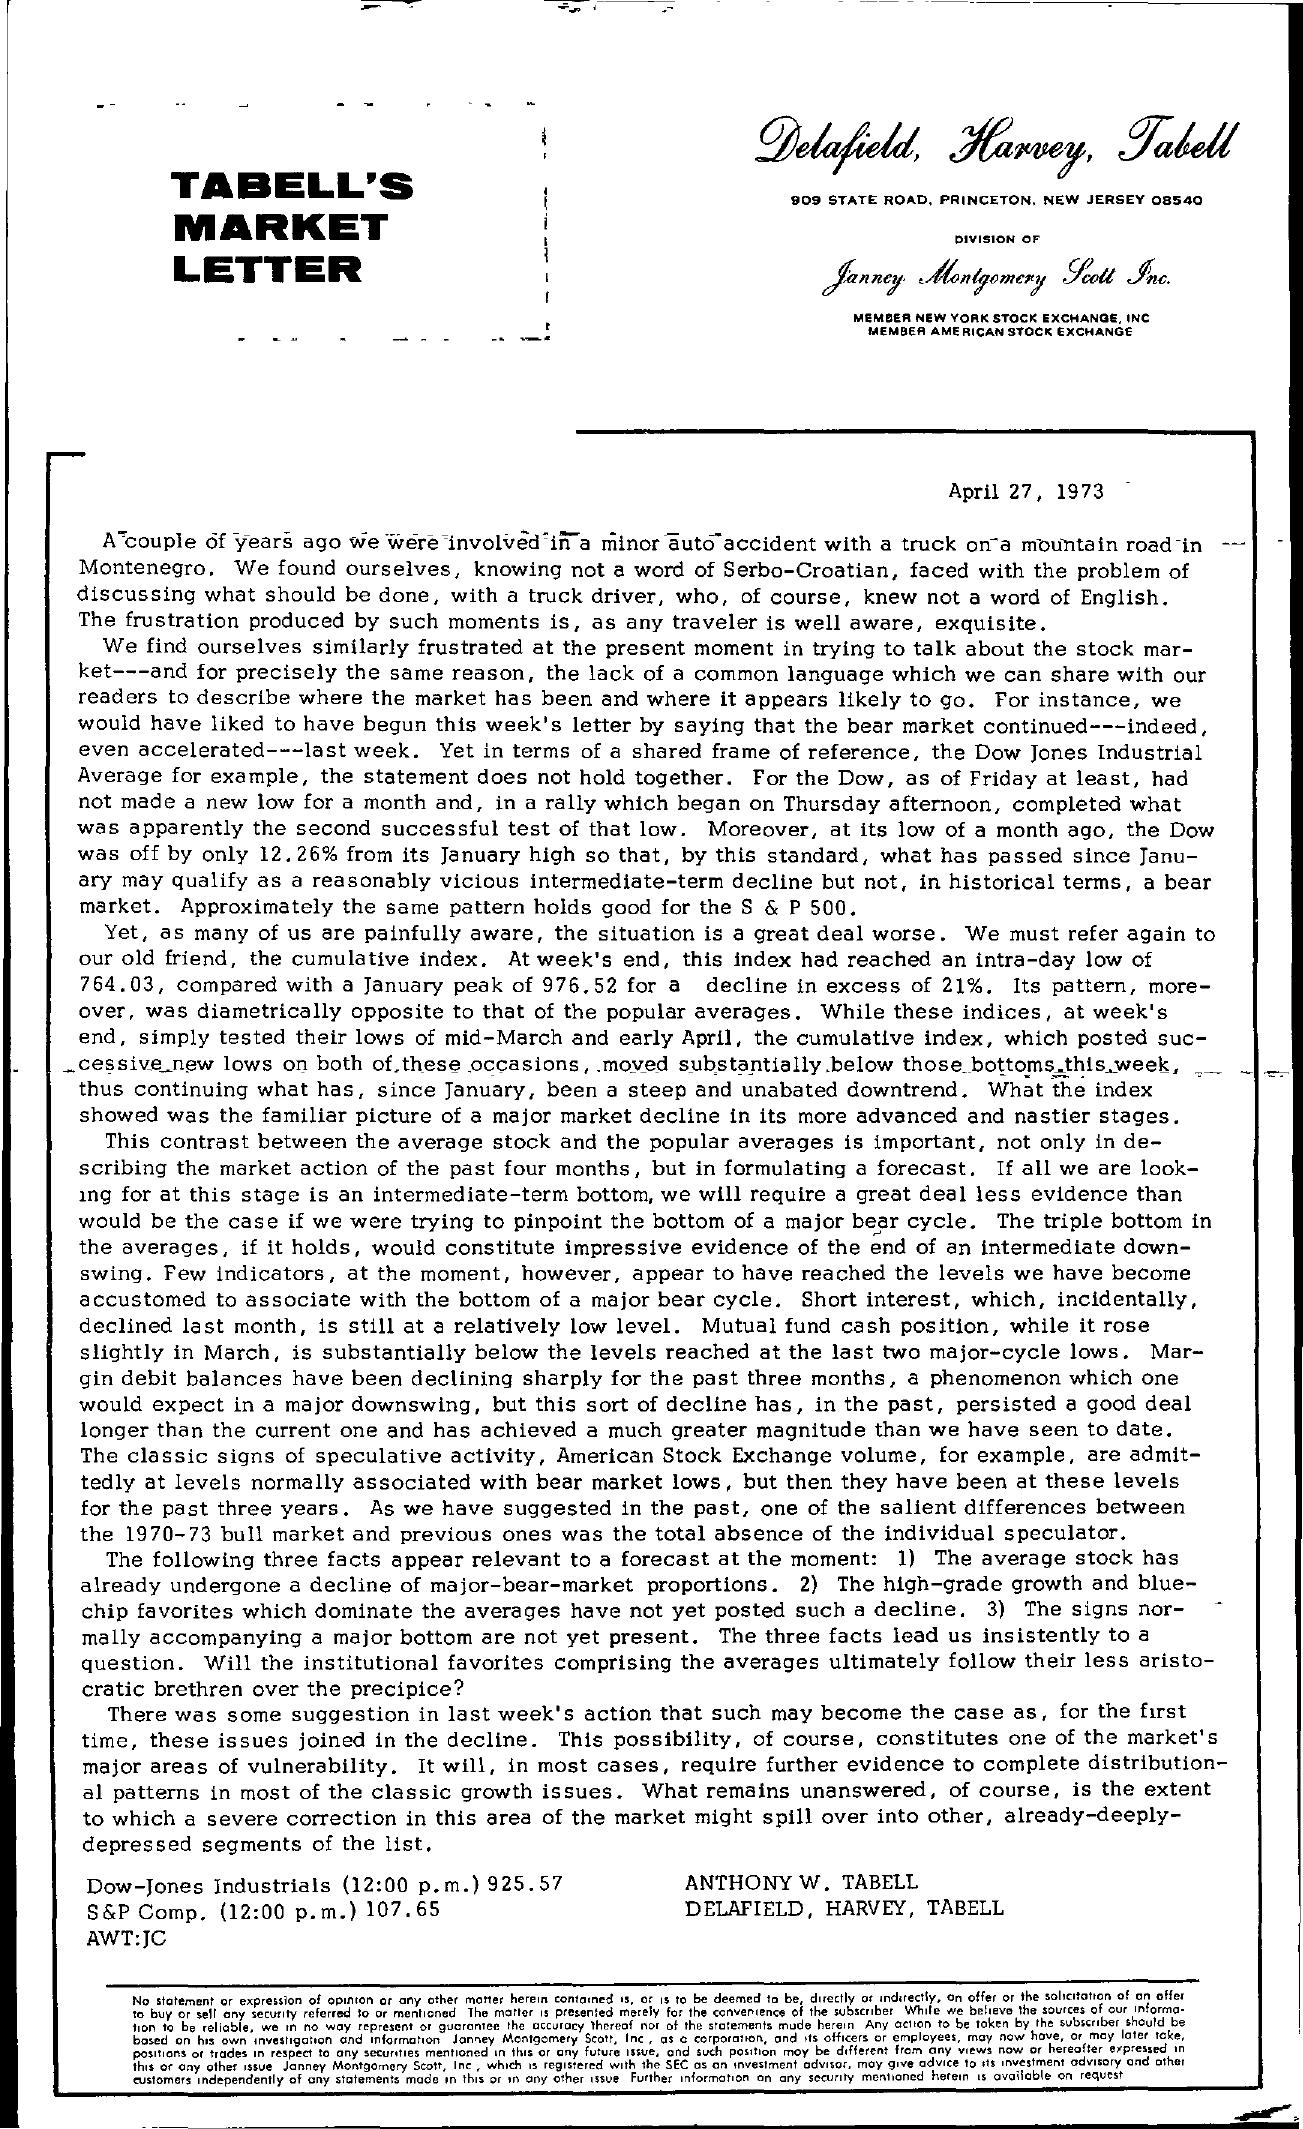 Tabell's Market Letter - April 27, 1973